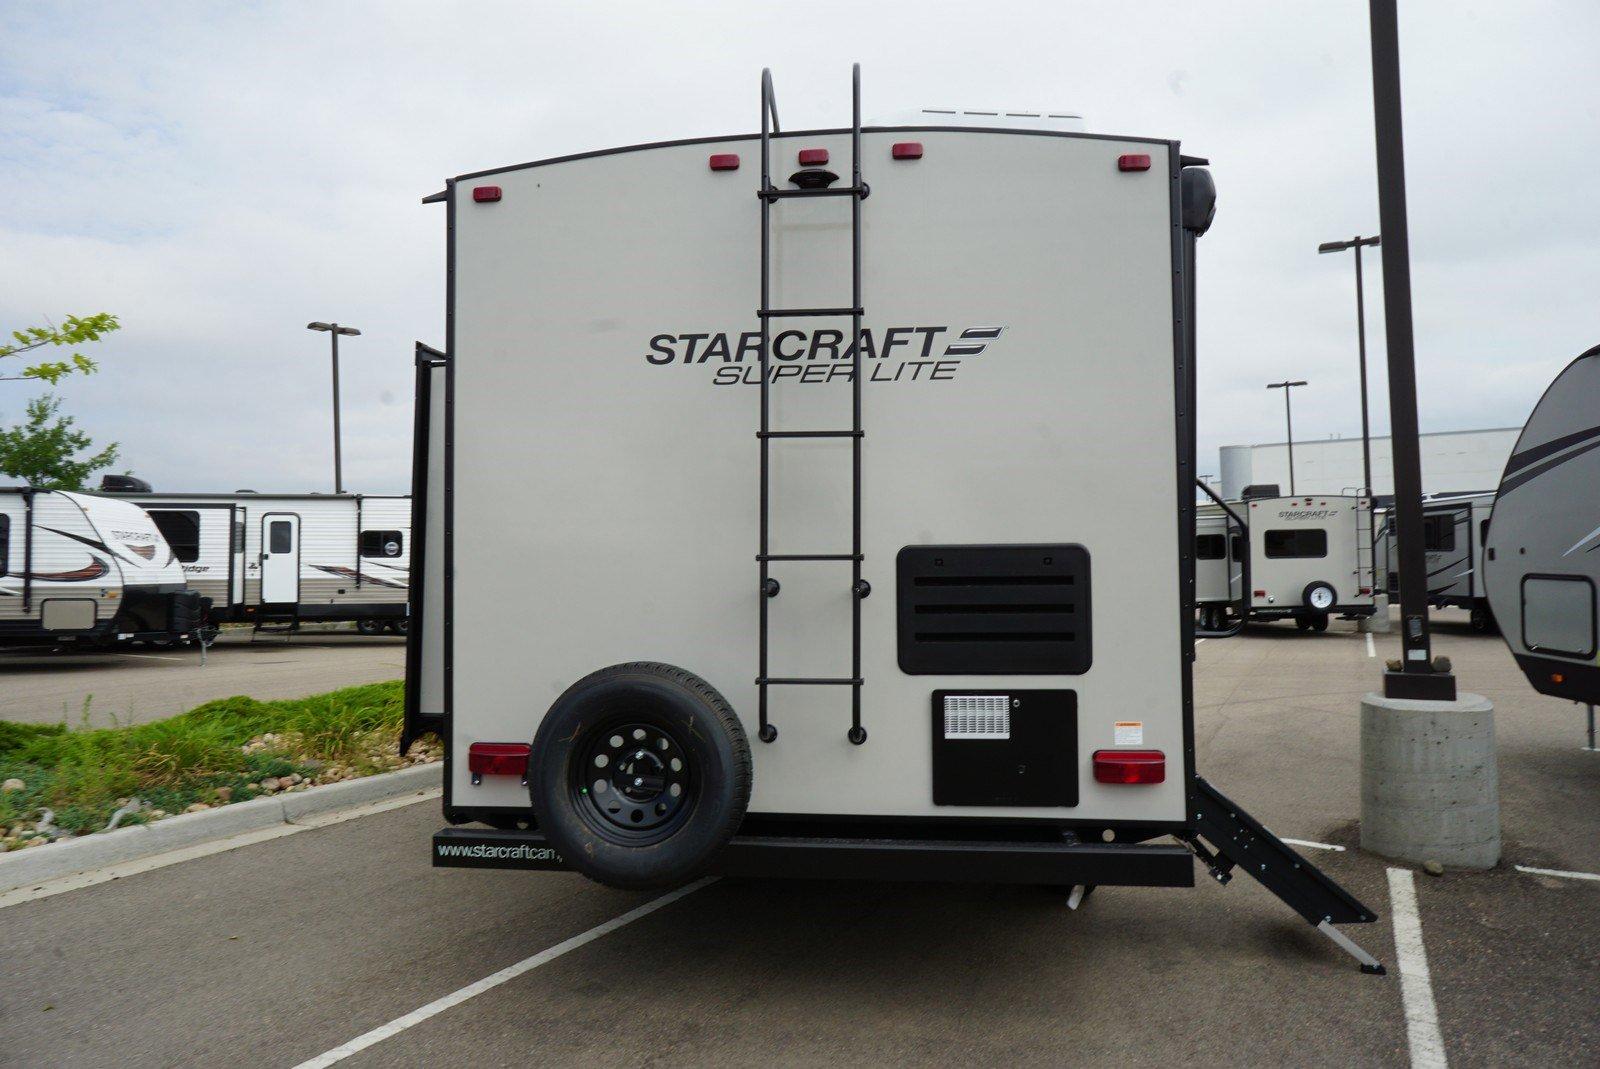 2020 STARCRAFT SUPER LITE 212FB